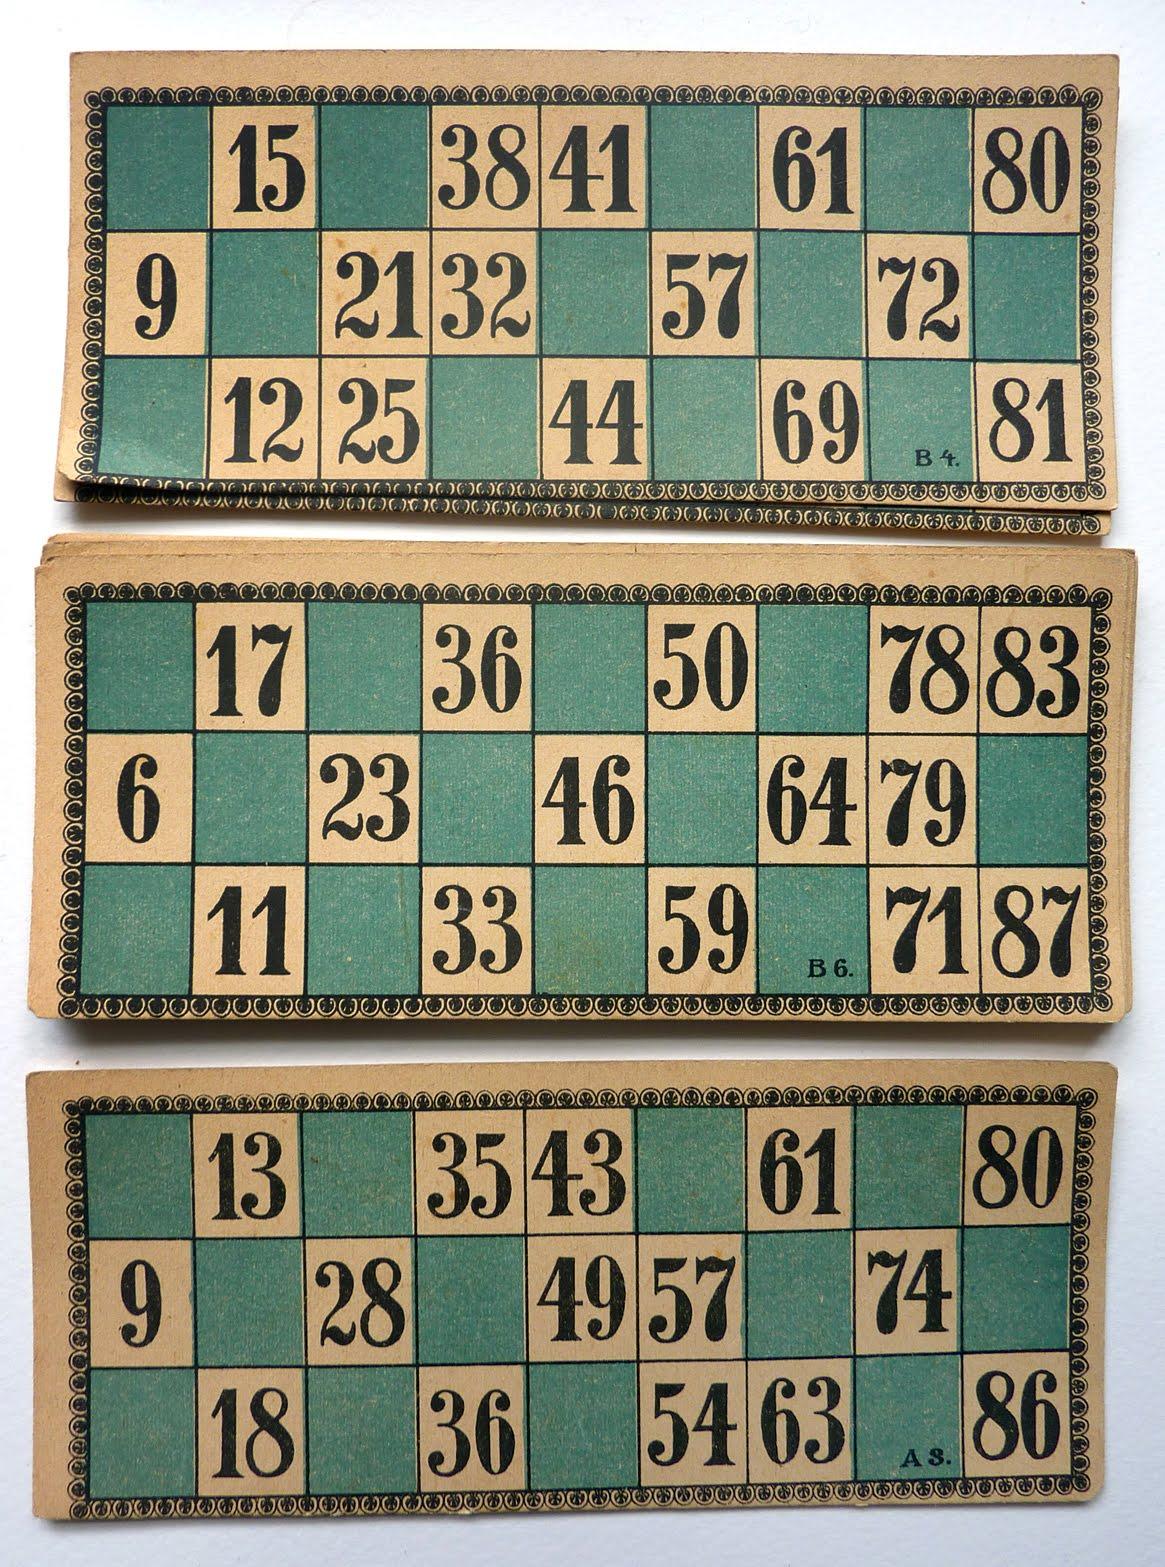 Lotto Bingo